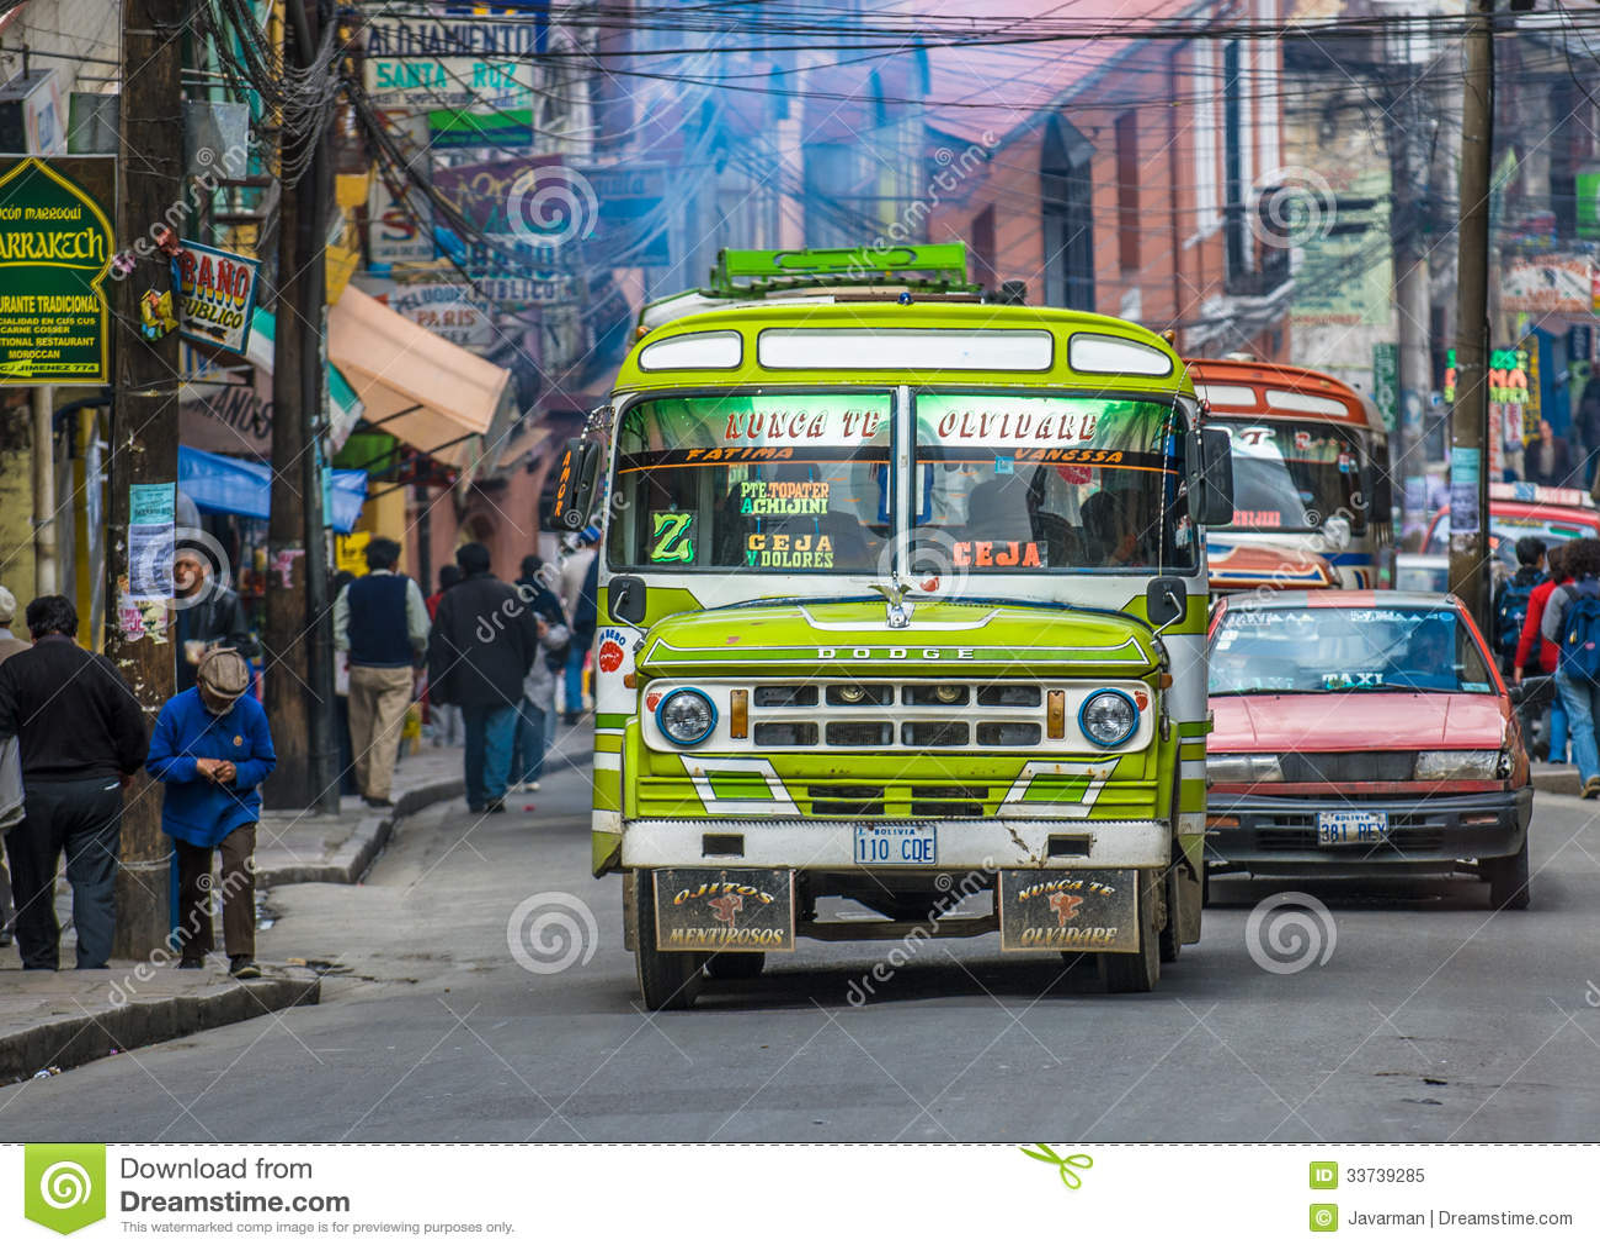 ЛА PAZ, БОЛИВИЯ - 10-ое января: Улица Ла Paz 10-ого января,